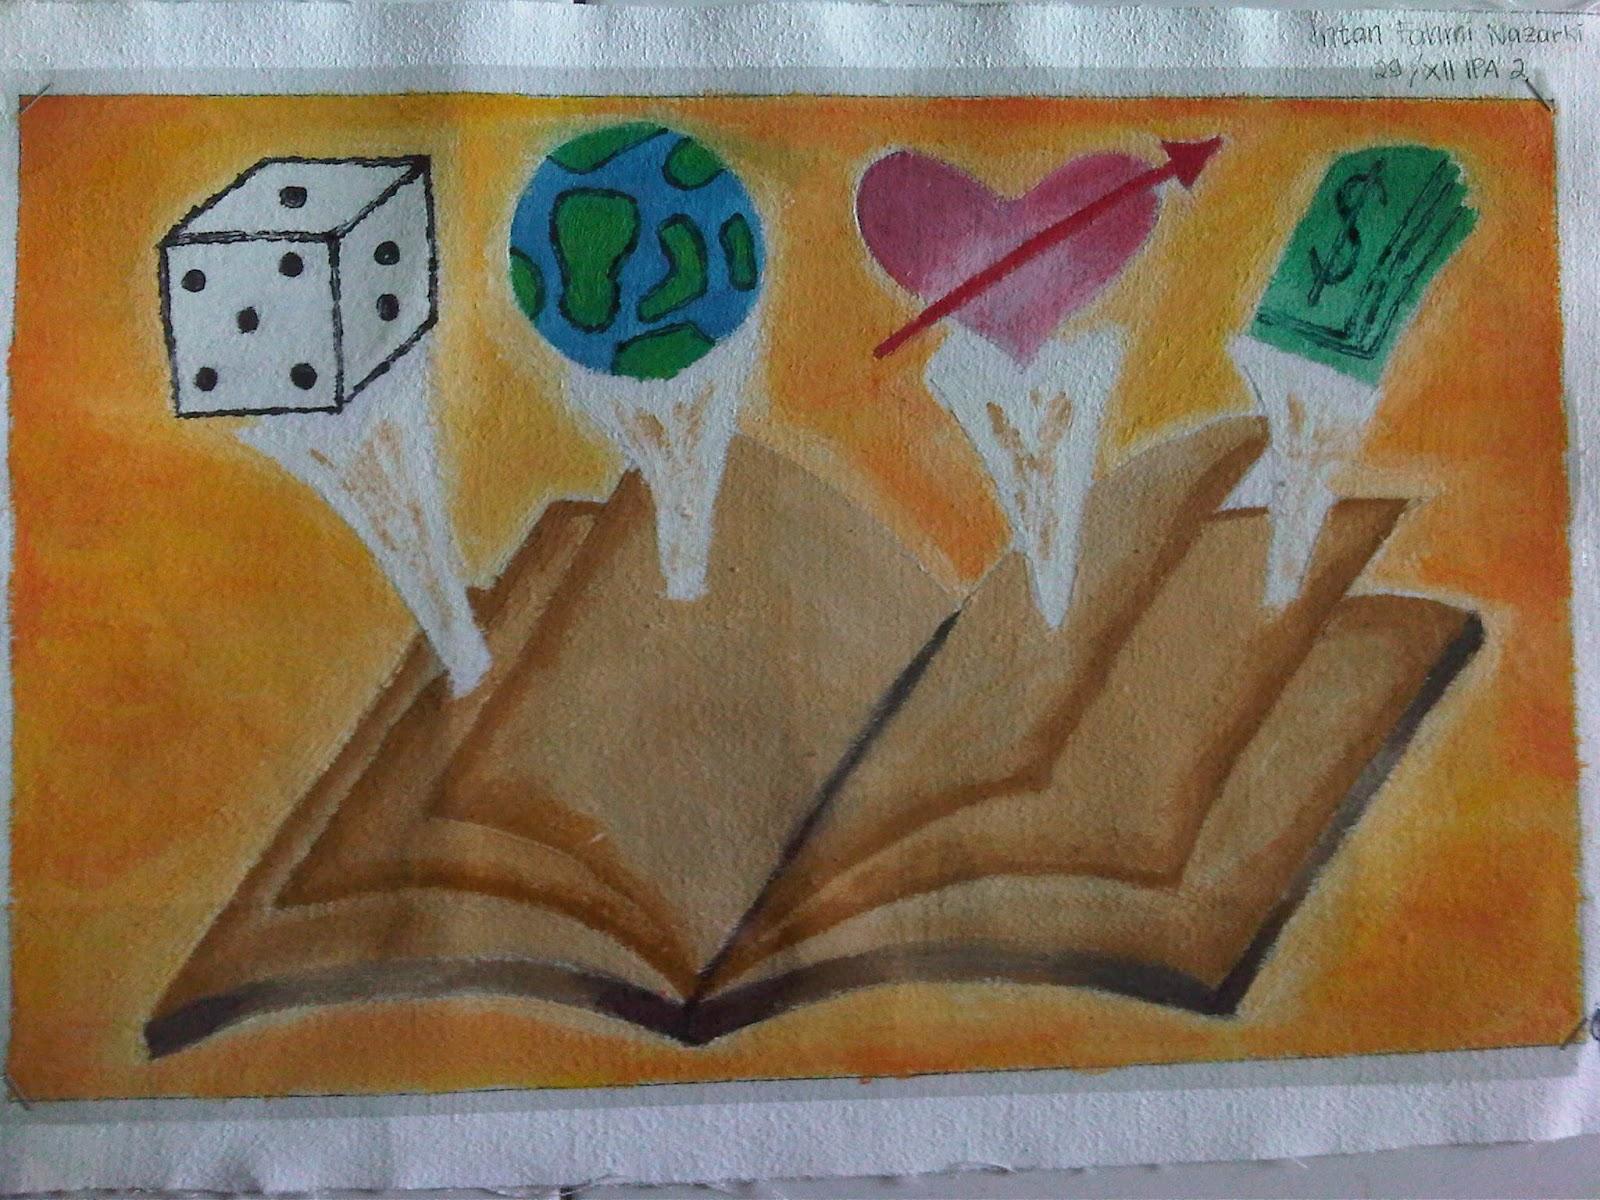 Lukisan Aliran Surealisme Related Keywords Suggestions Lukisan